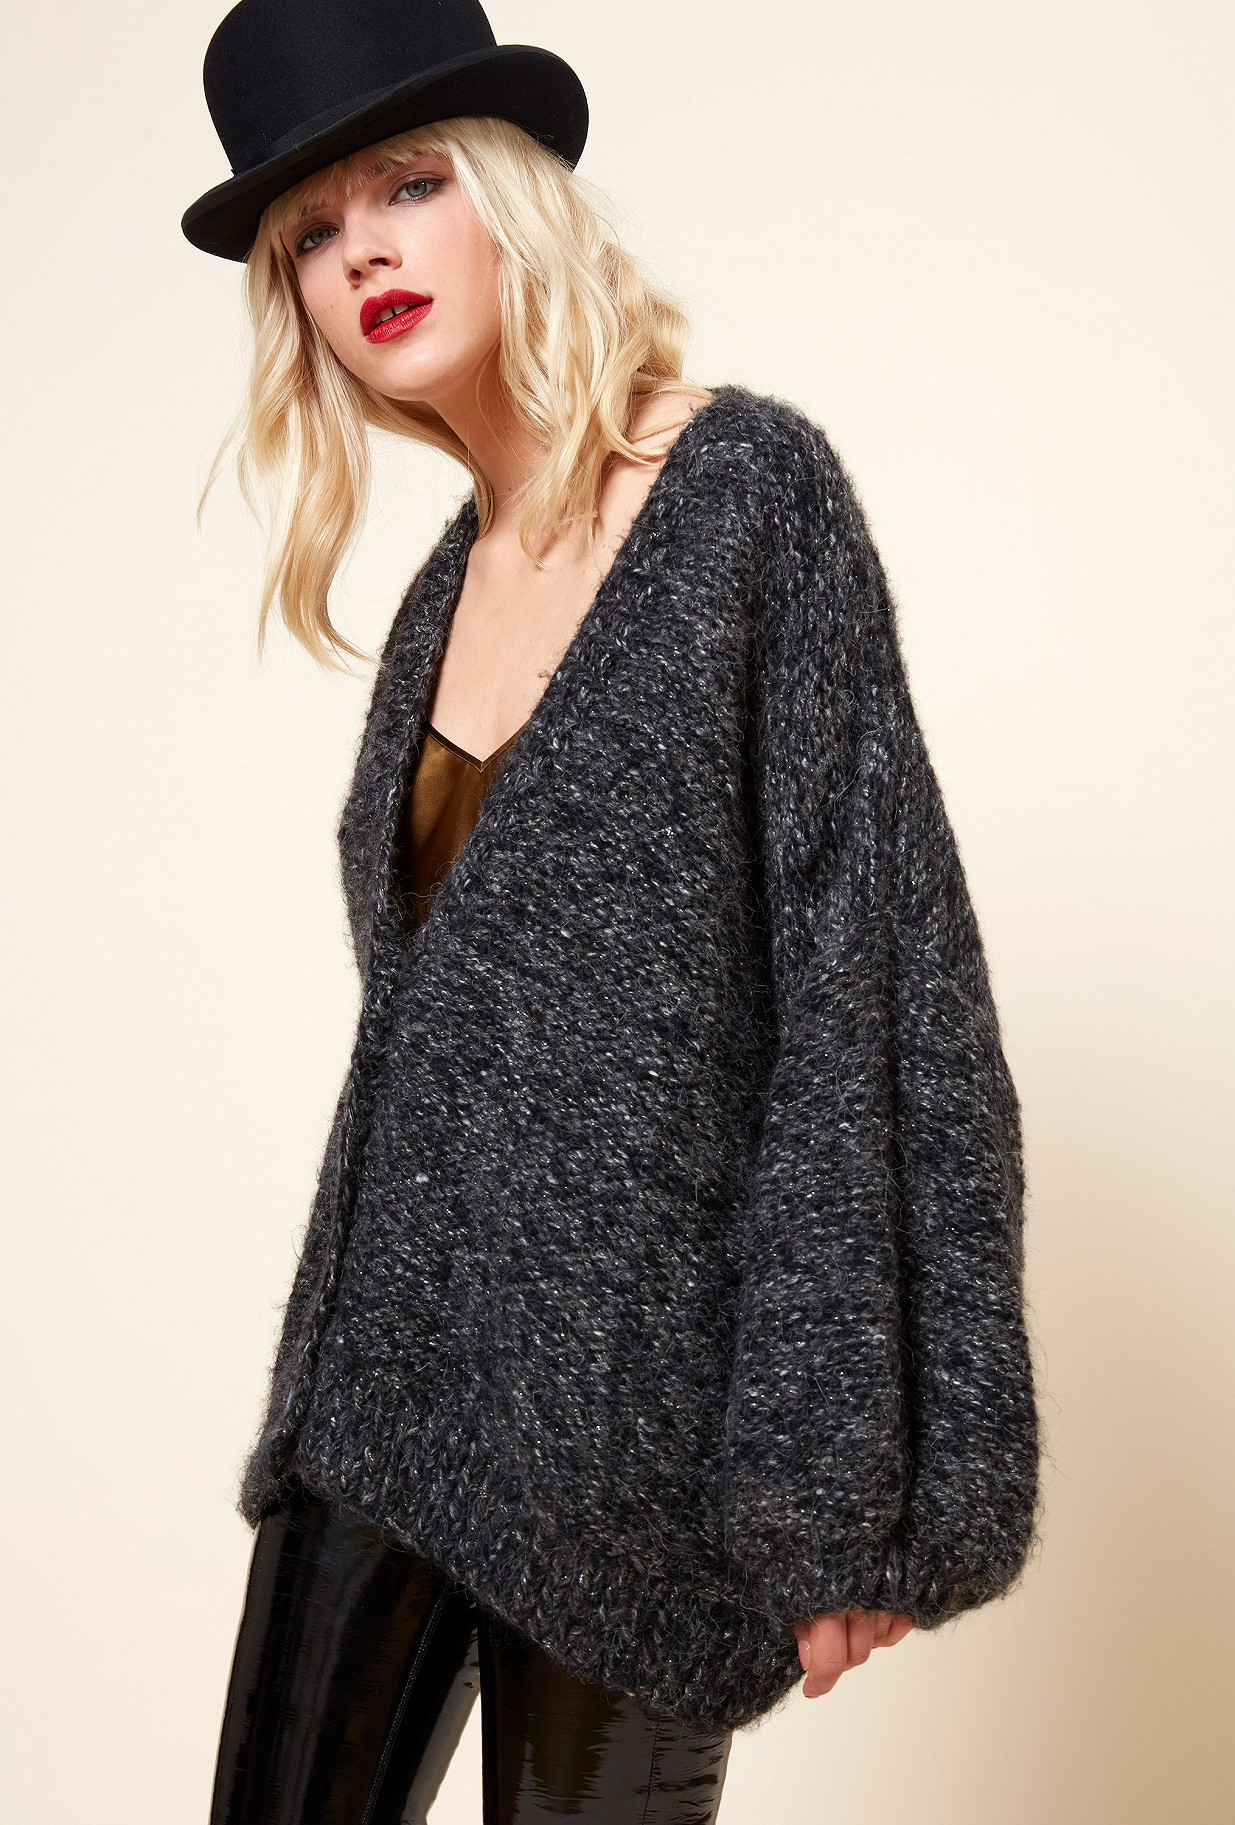 Grey  Knit  Appalaches Mes demoiselles fashion clothes designer Paris